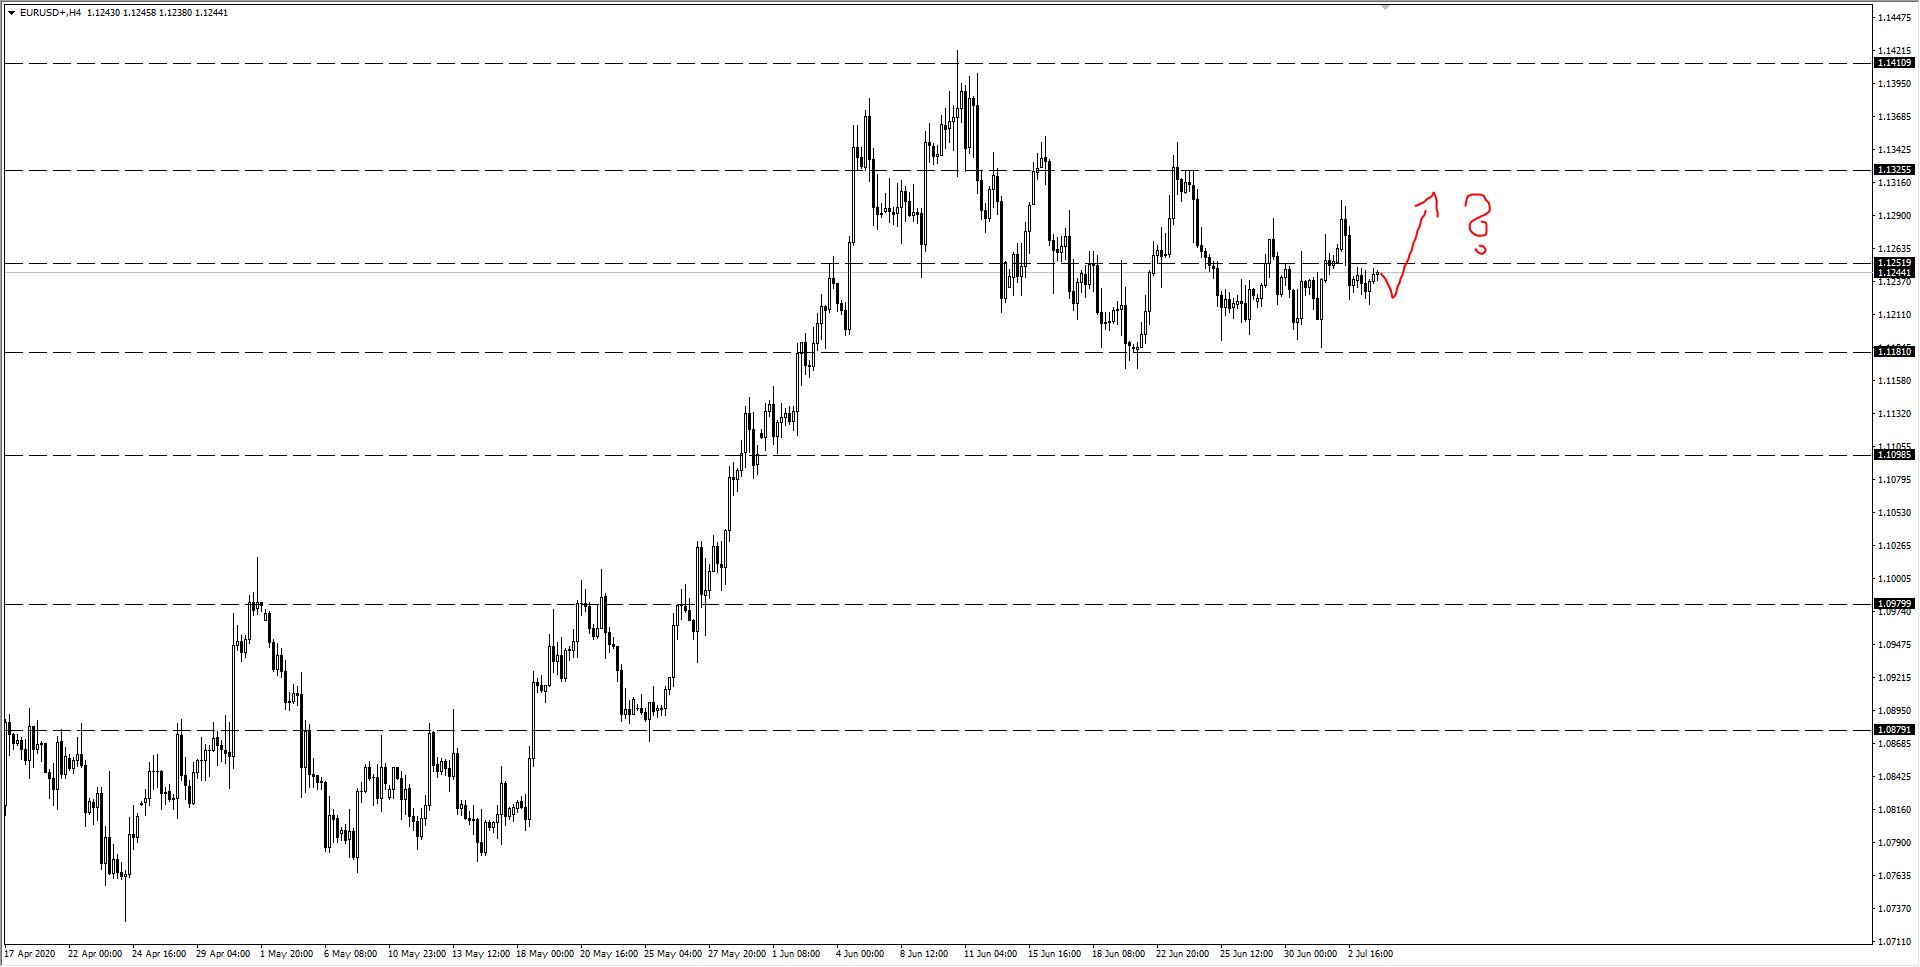 wykres Kurs euro EURUSD H4 05.07.2020